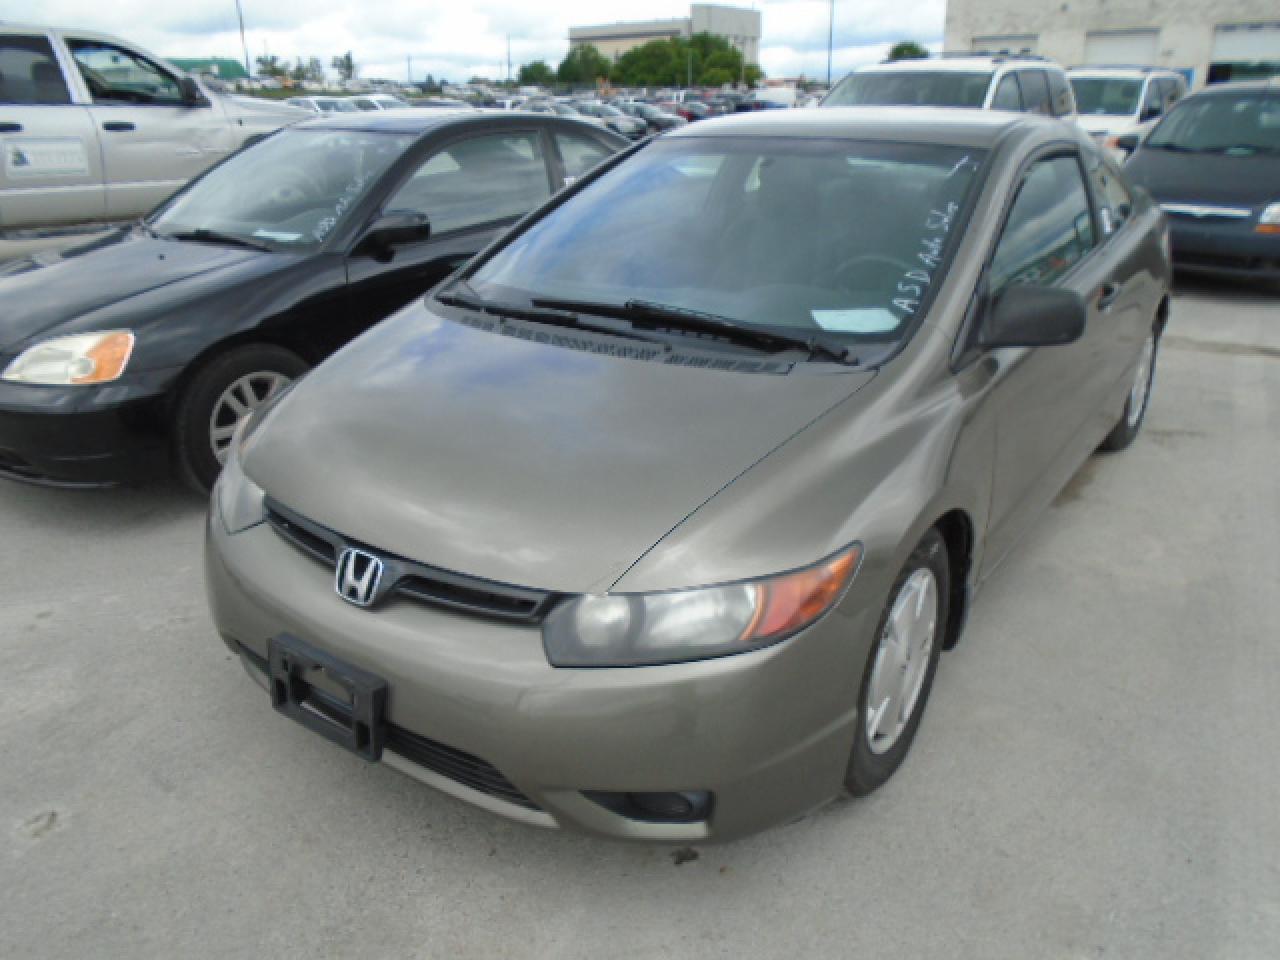 2008 Honda Civic (Canada)